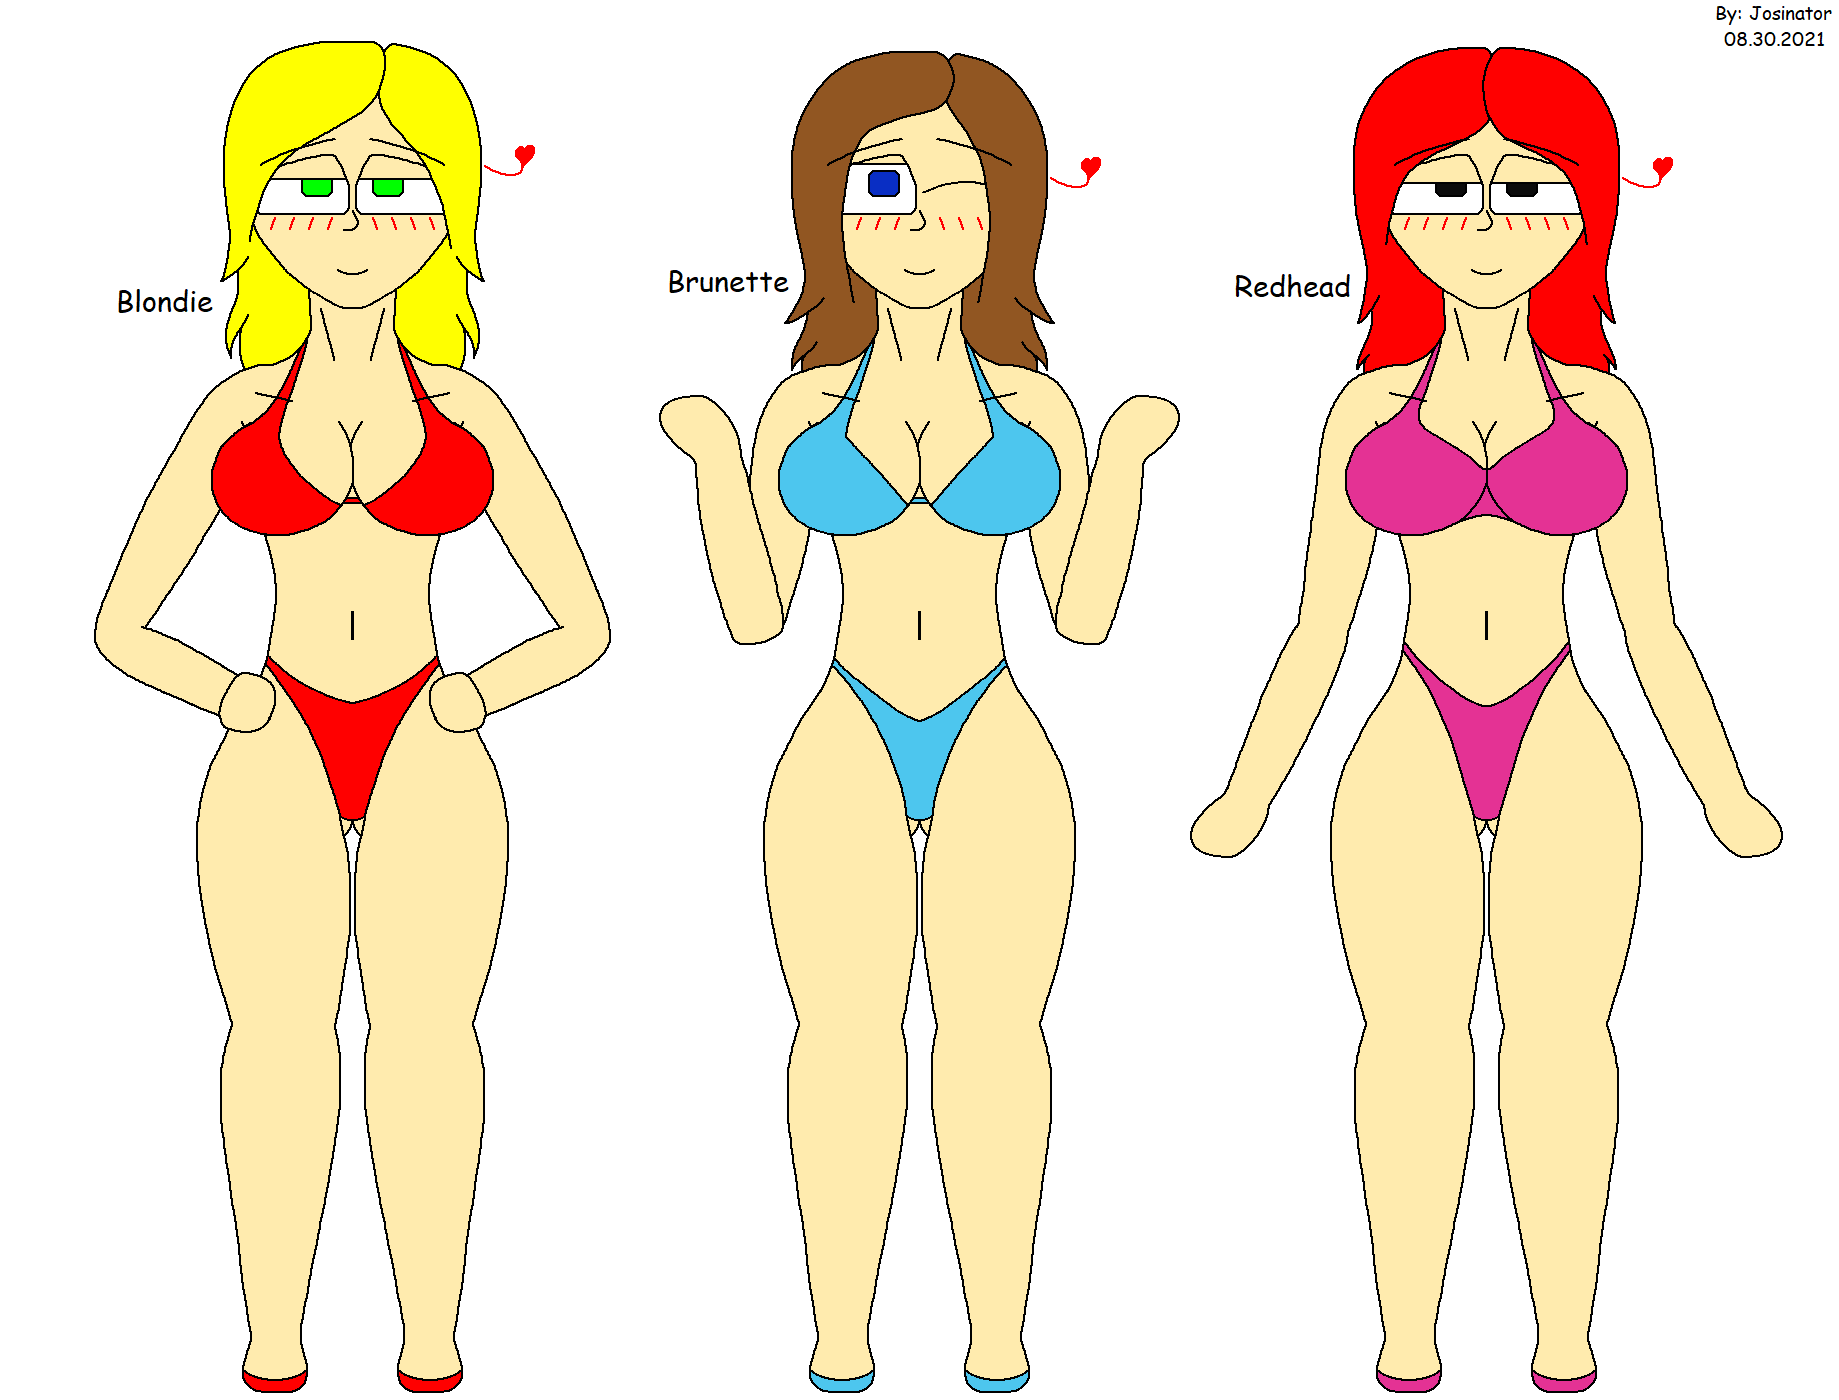 Blondie, Brunette and Redhead